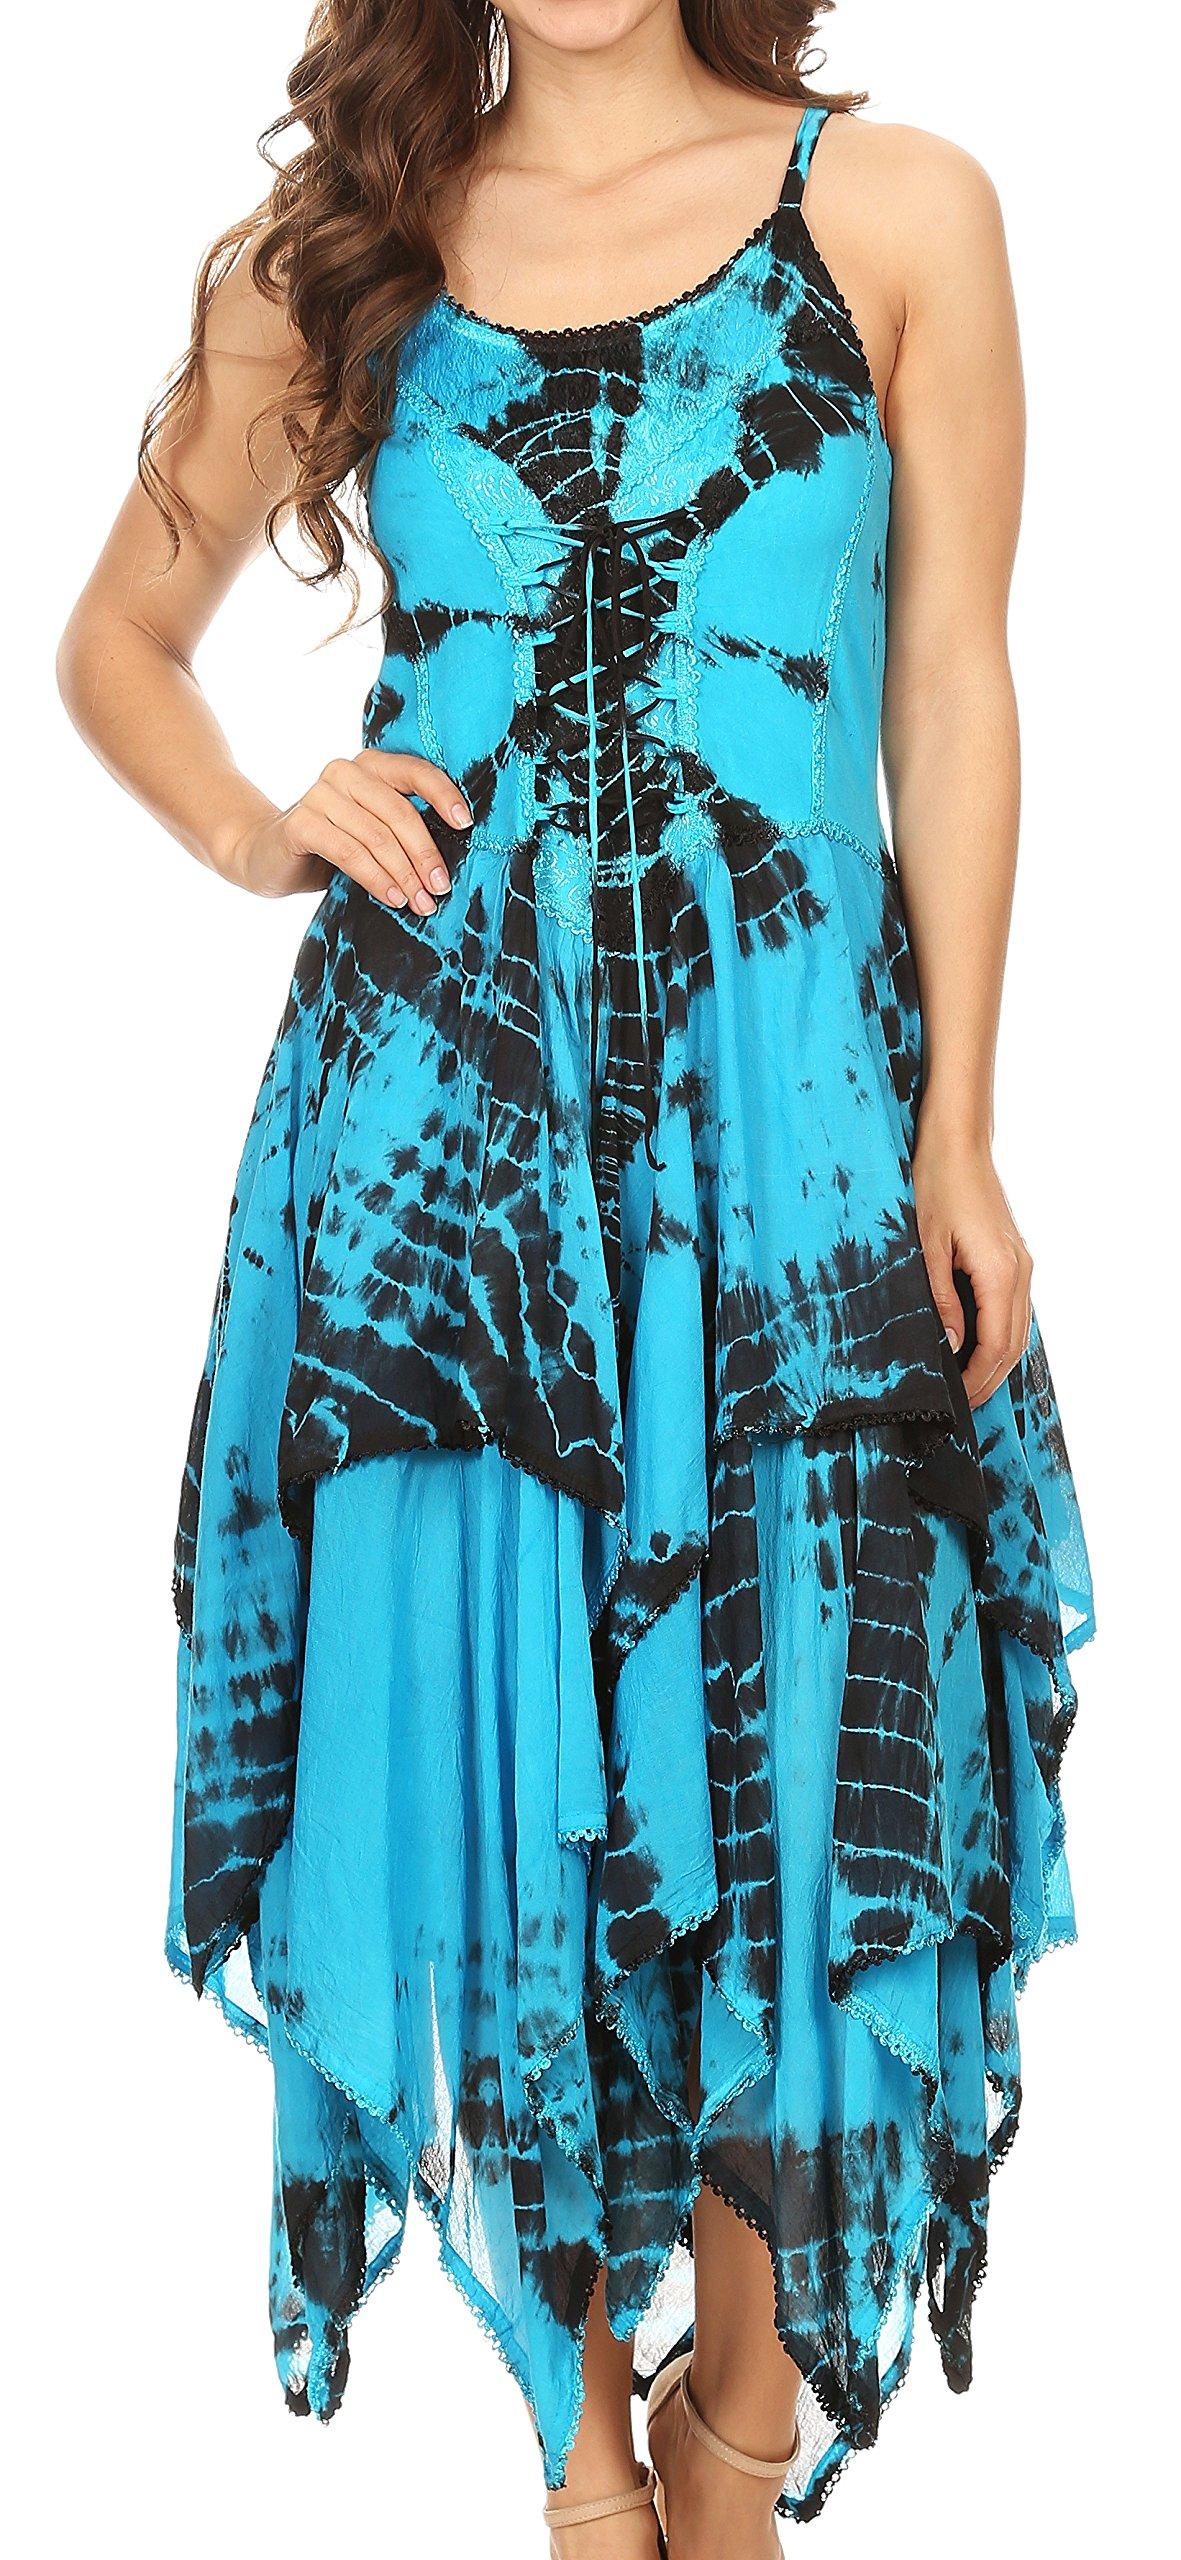 Available at Amazon: Sakkas 902 Annabella Corset Bodice Handkerchief Hem Dress - Black/Turquoise - One Size Plus